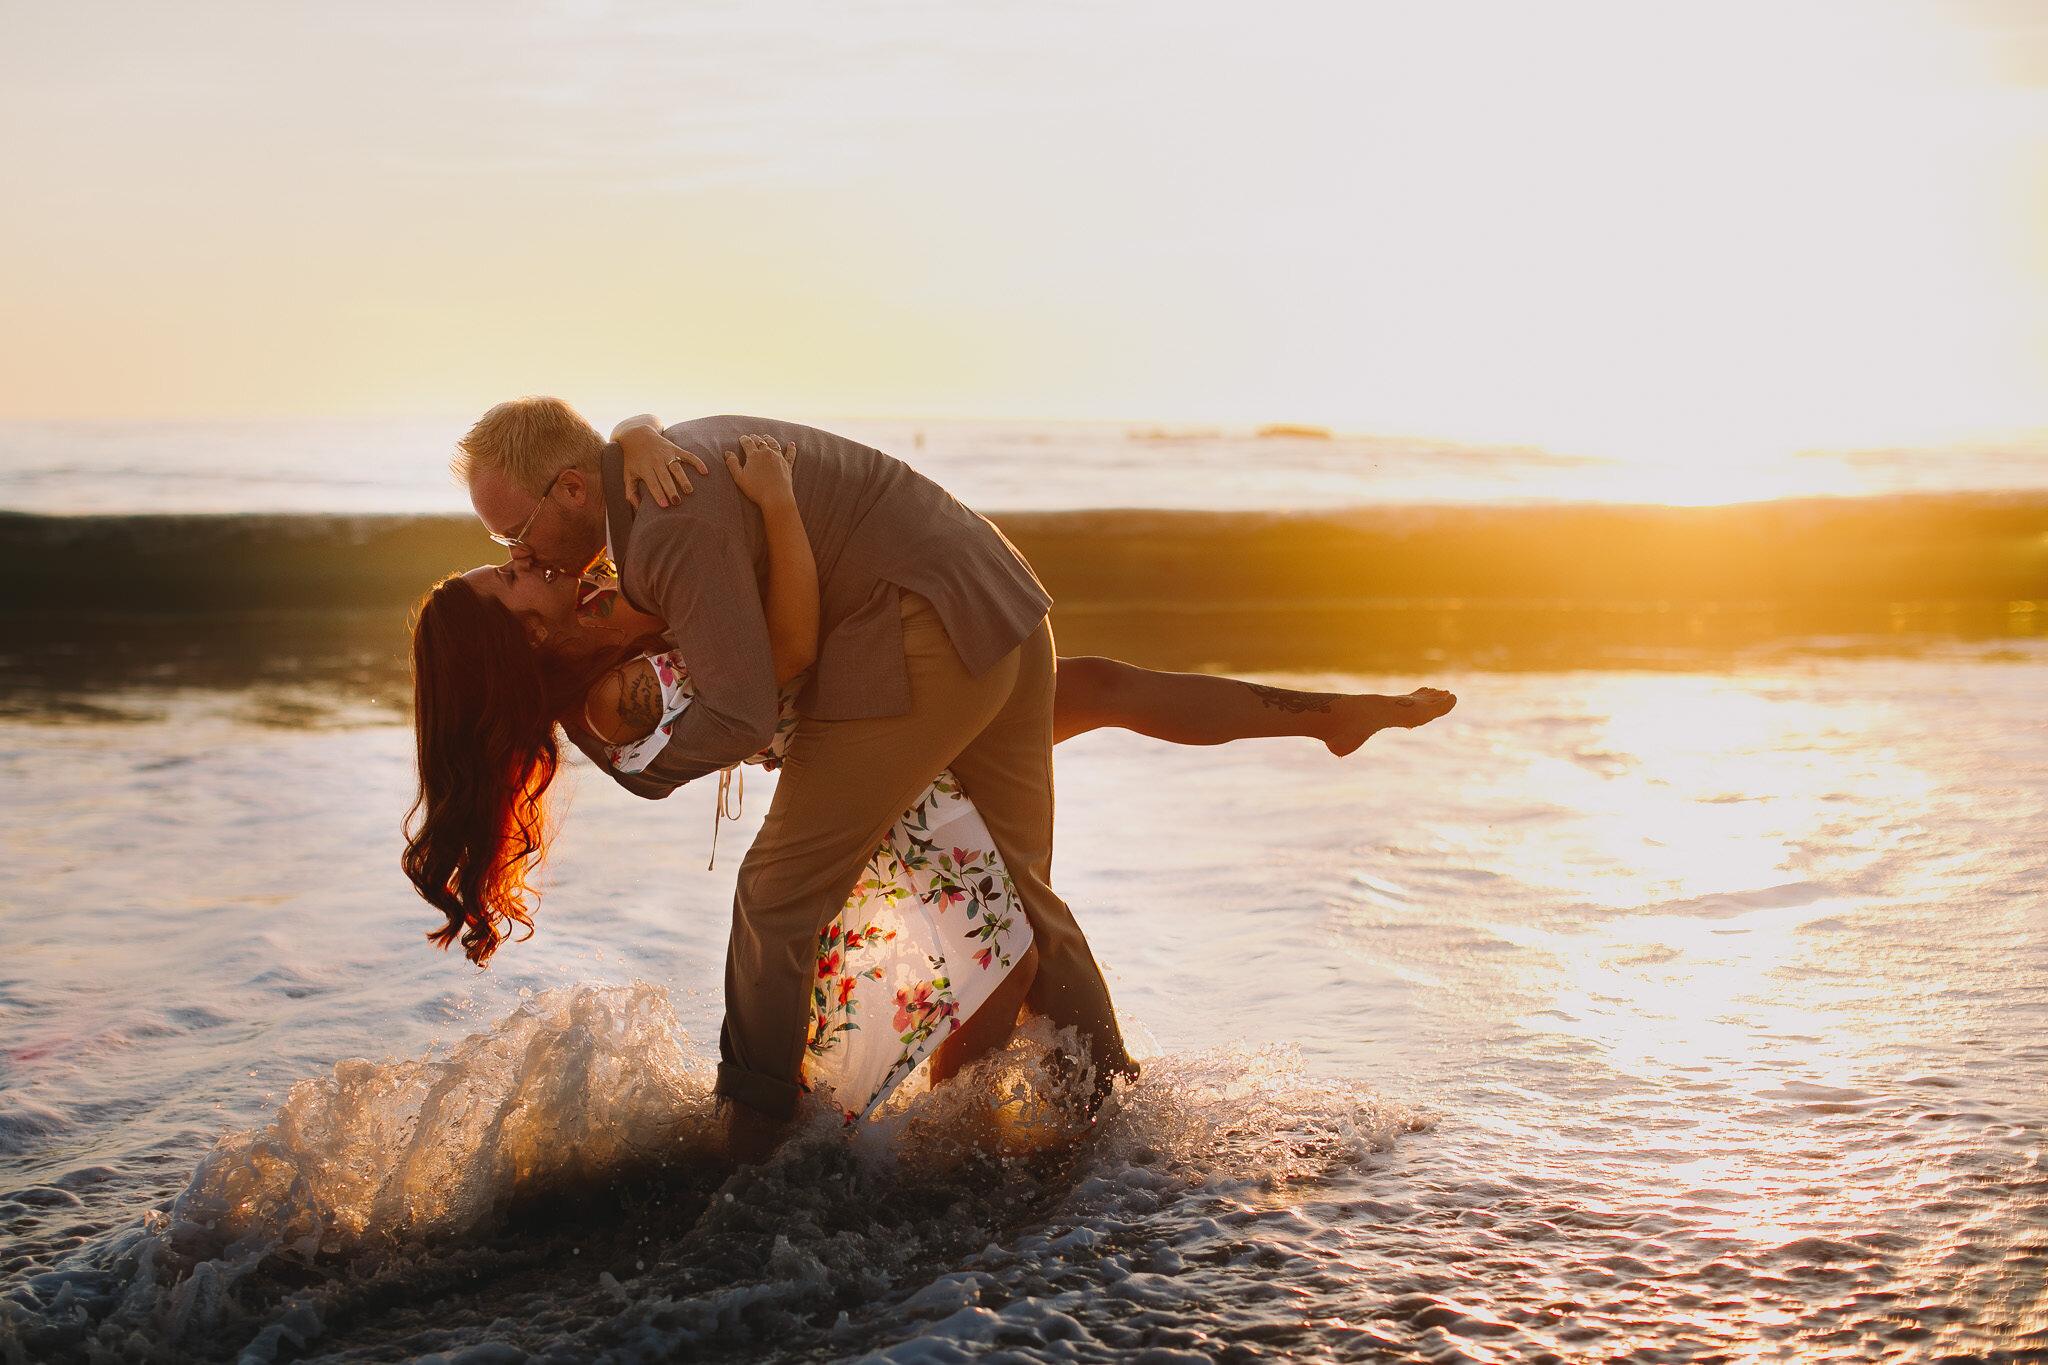 Archer Inspired Photography - Ciera and Zach - Carmel by the sea - socal wedding photographer-1.jpg